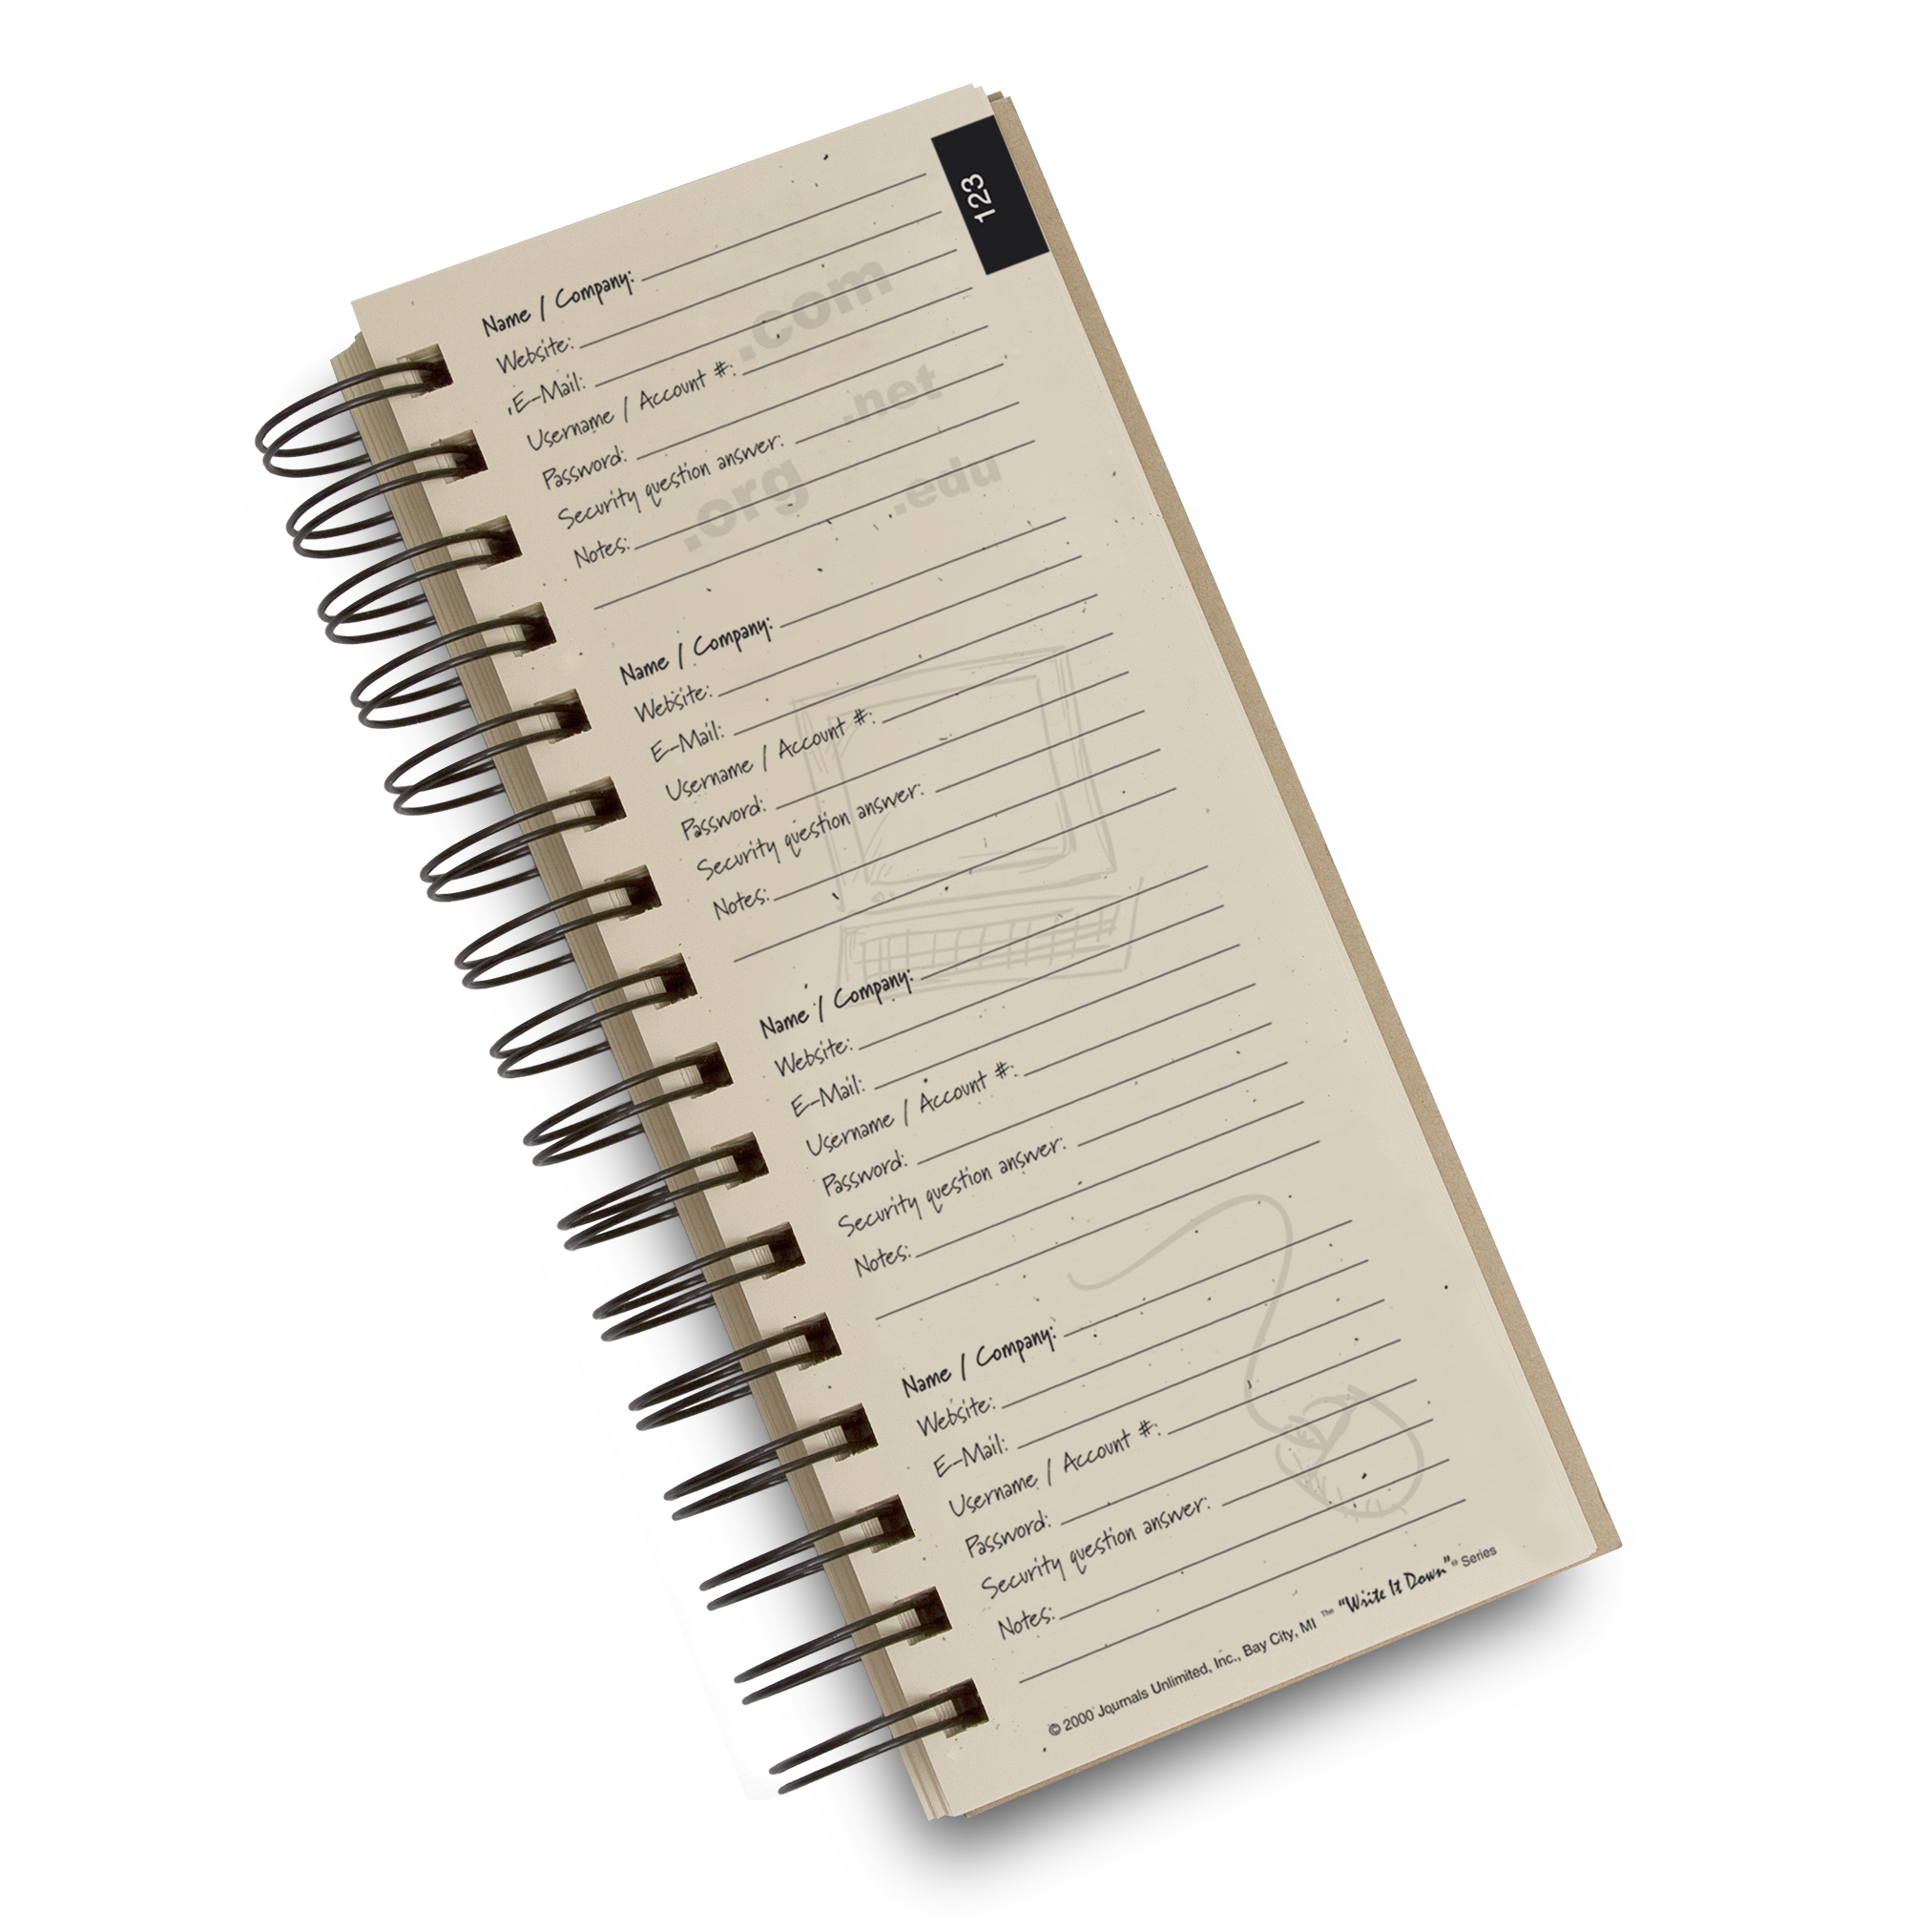 Journals amp Diaries  Writing Journals amp Diary Books  Staples